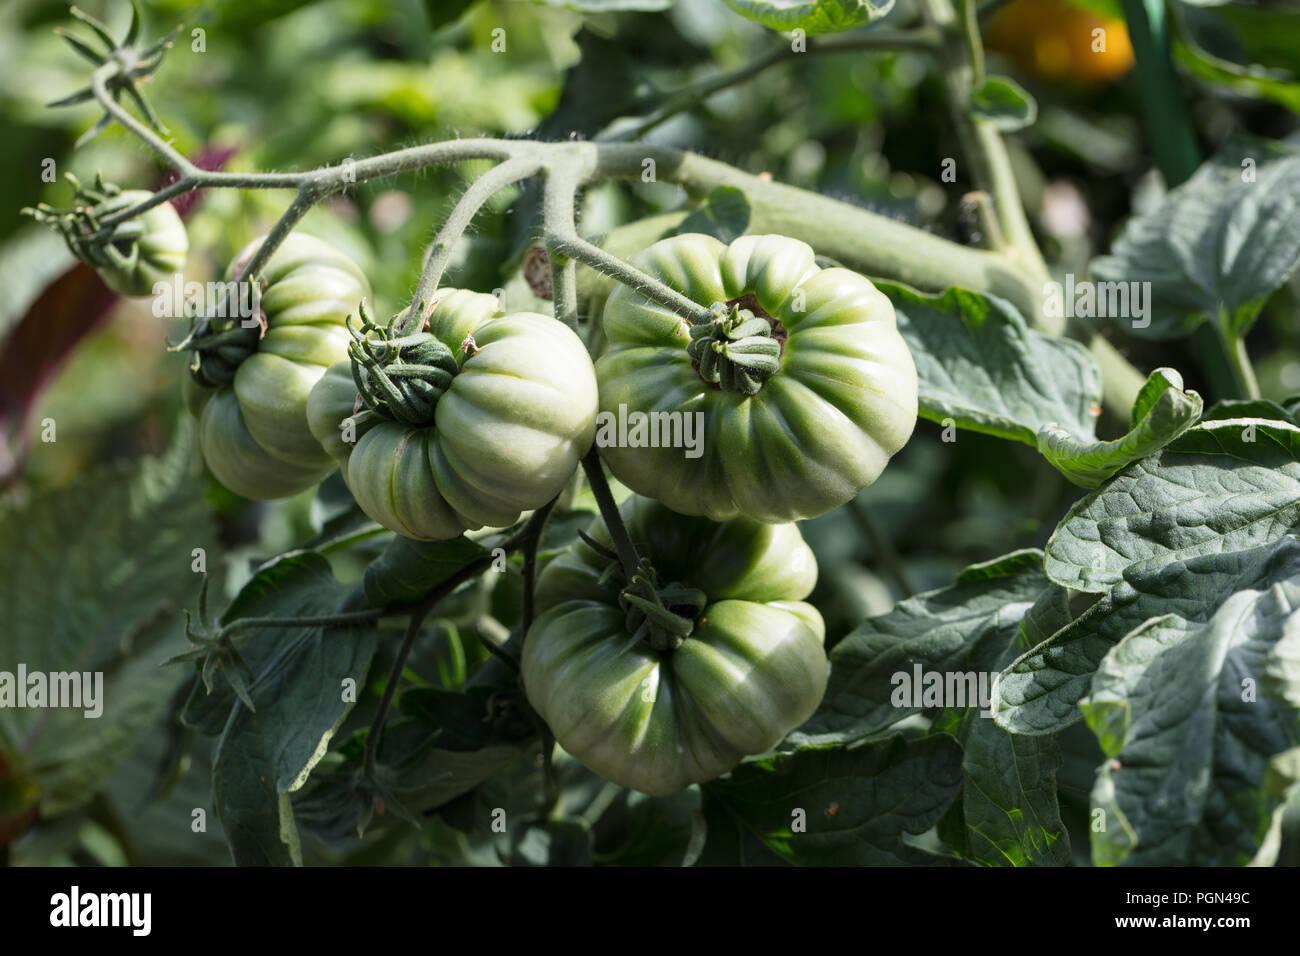 'Ananas' Beefsteak tomato, Bifftomat (Solanum lycopersicum) - Stock Image